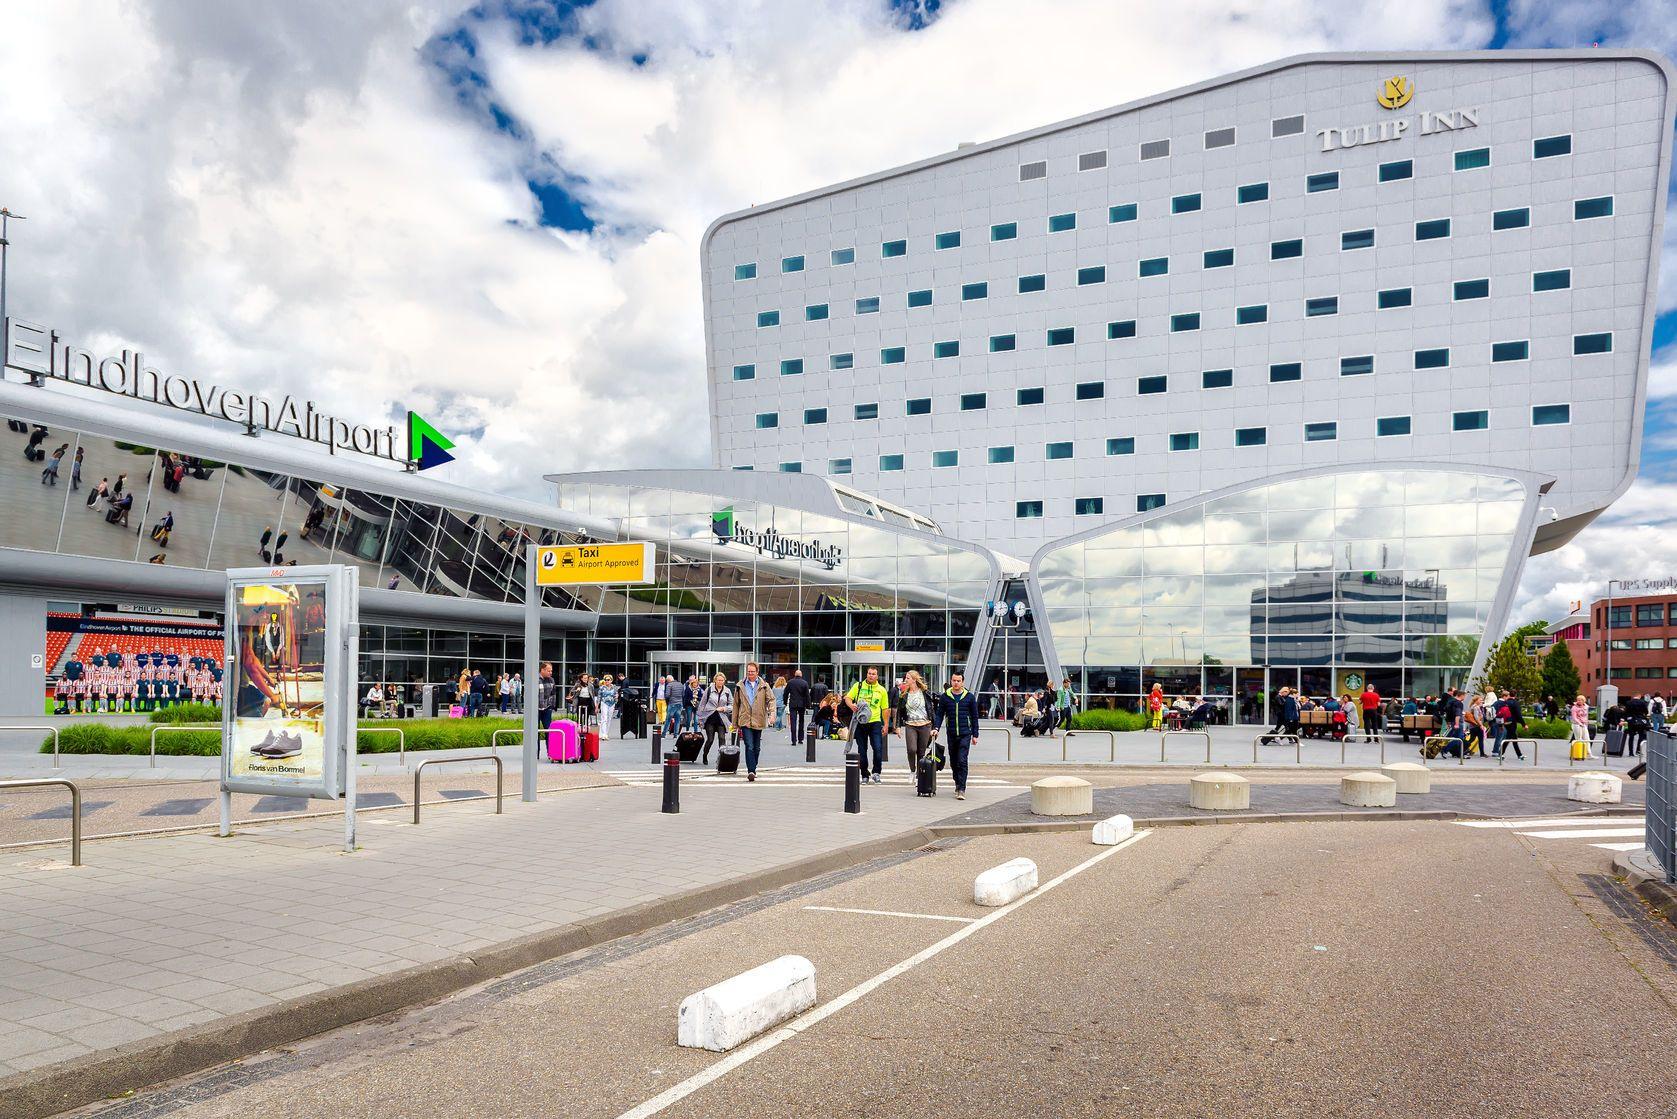 Dav lidí na letišti Eindhoven | amoklv/123RF.com